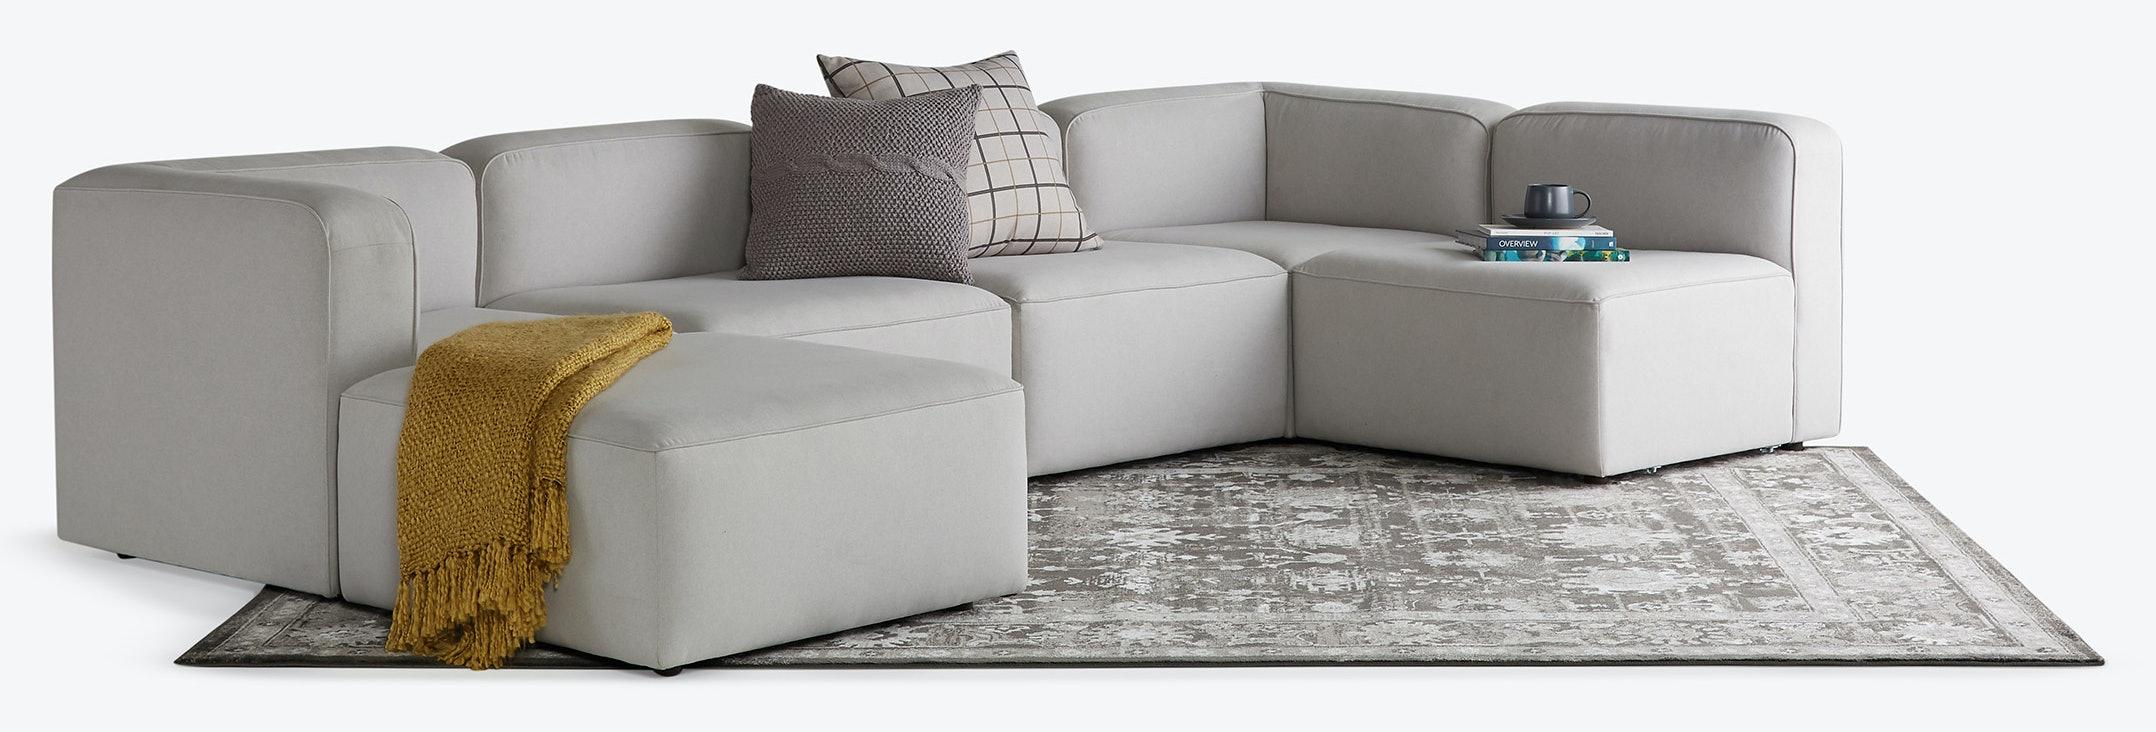 hero logan modular sofa bumper sectional backlog